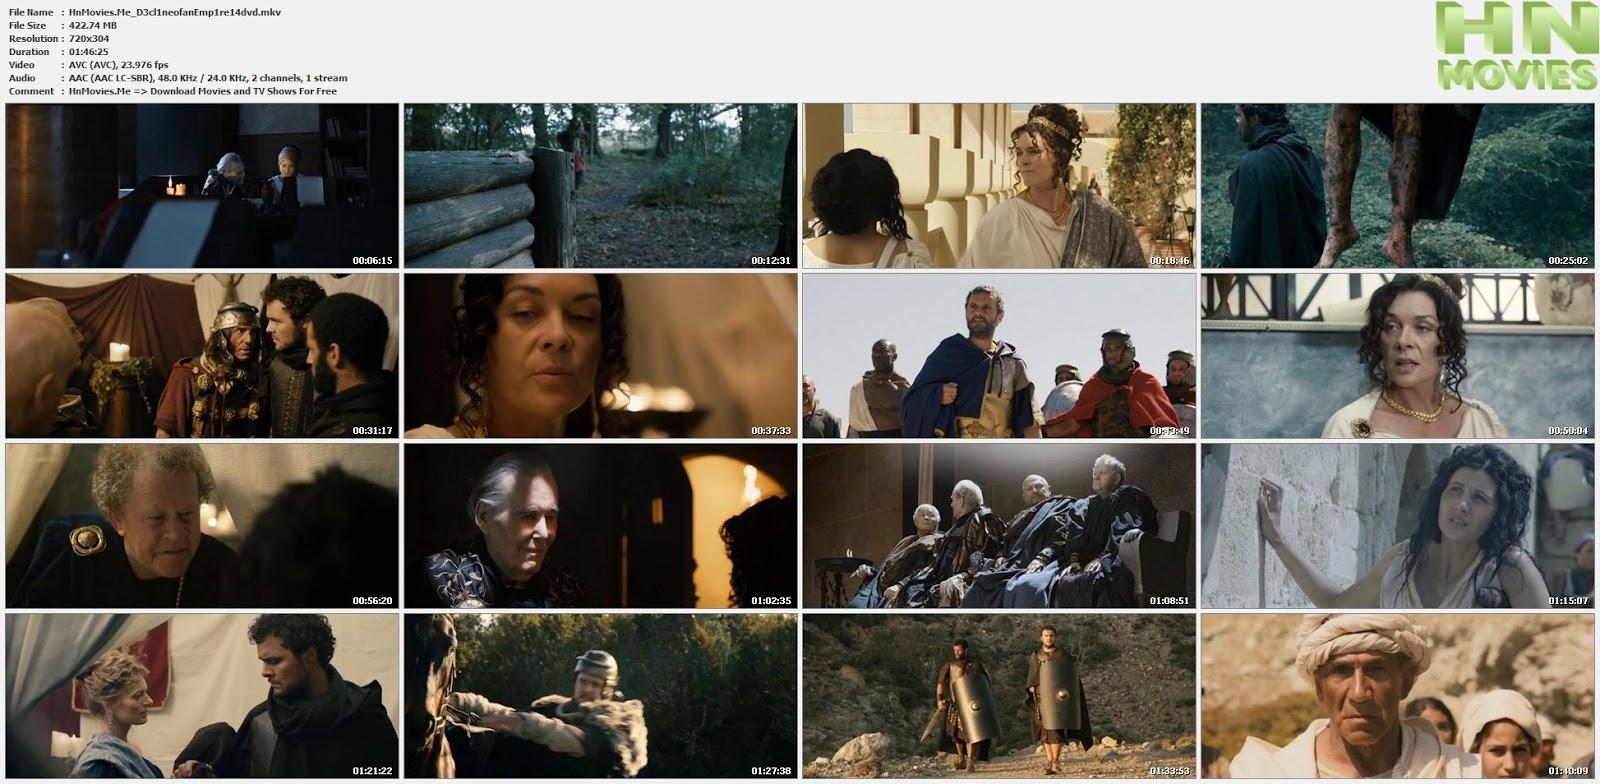 movie screenshot of Katherine of Alexandria fdmovie.com